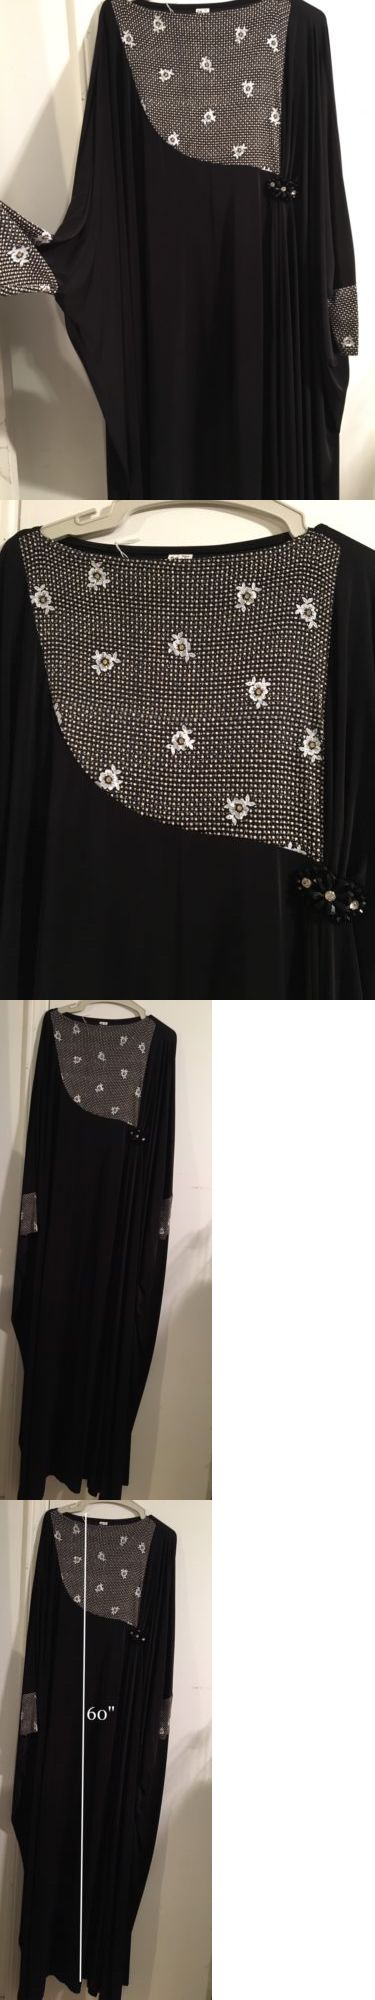 Middle East 155253: Islamic Muslim Women Black Plain Butterfly Abaya Long Dress Maxi W Scarf Size 58 -> BUY IT NOW ONLY: $89.99 on eBay!